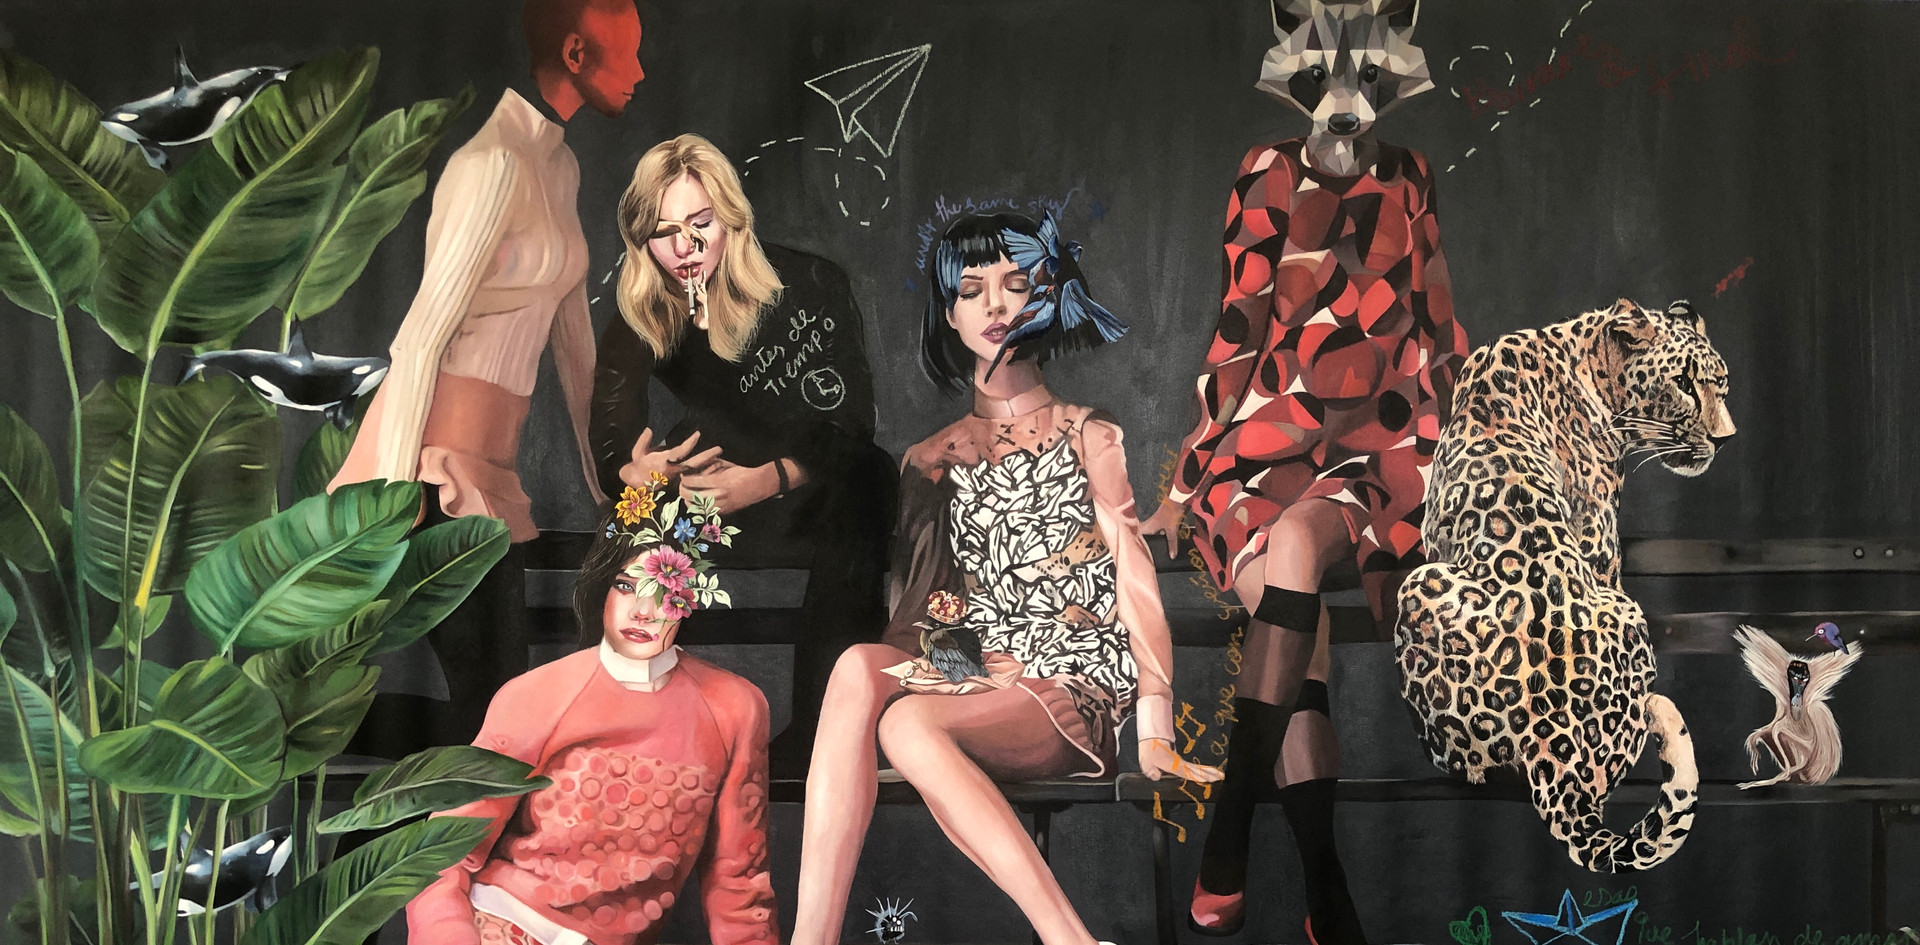 """Date la vuelta"" , 150x265 cms, oil on canvas, 2019."